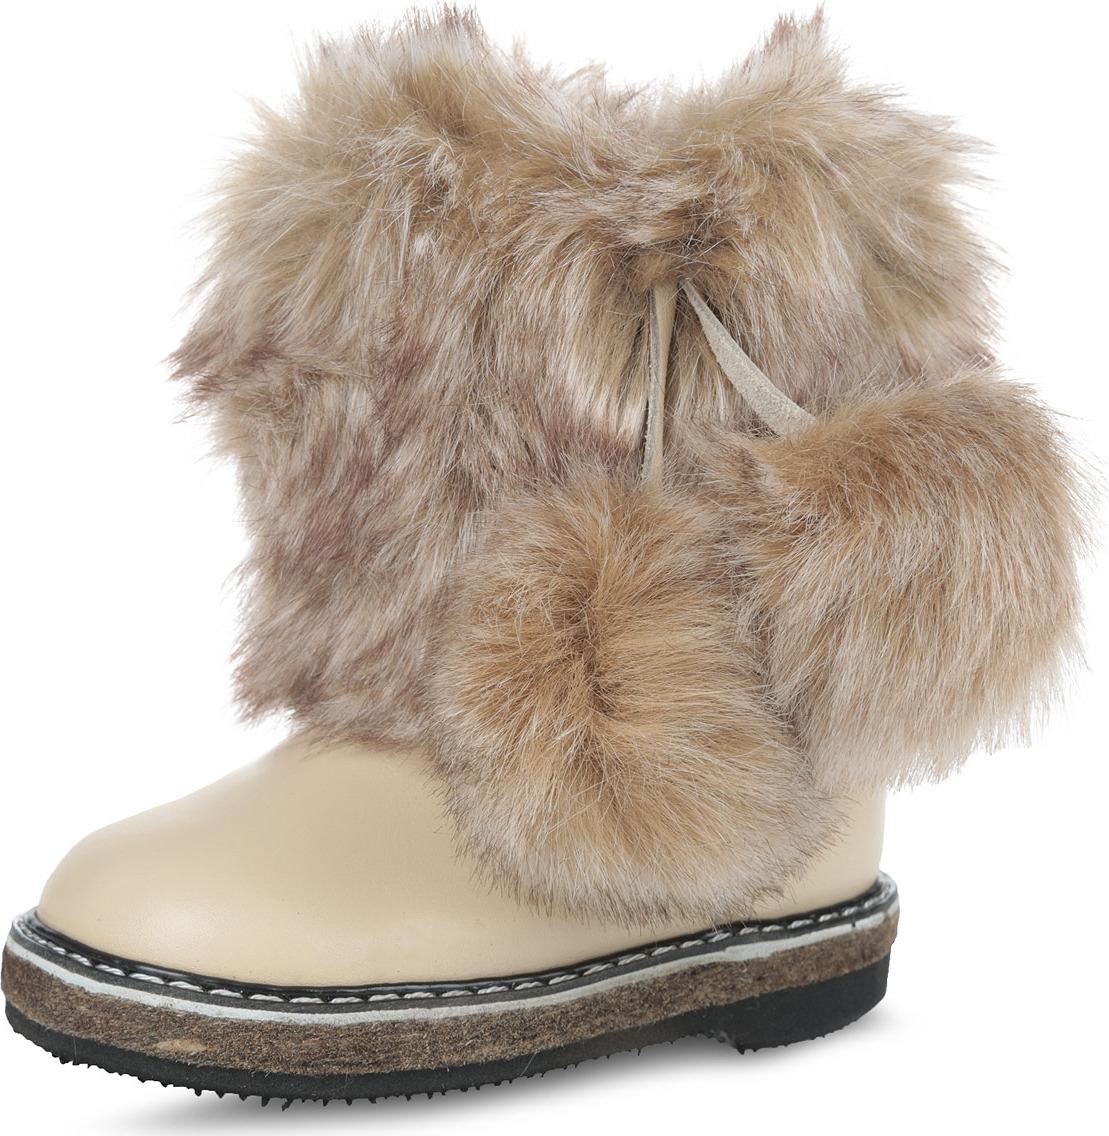 Унты 4U manitobah унты snowy owl mukluk женские коричневый